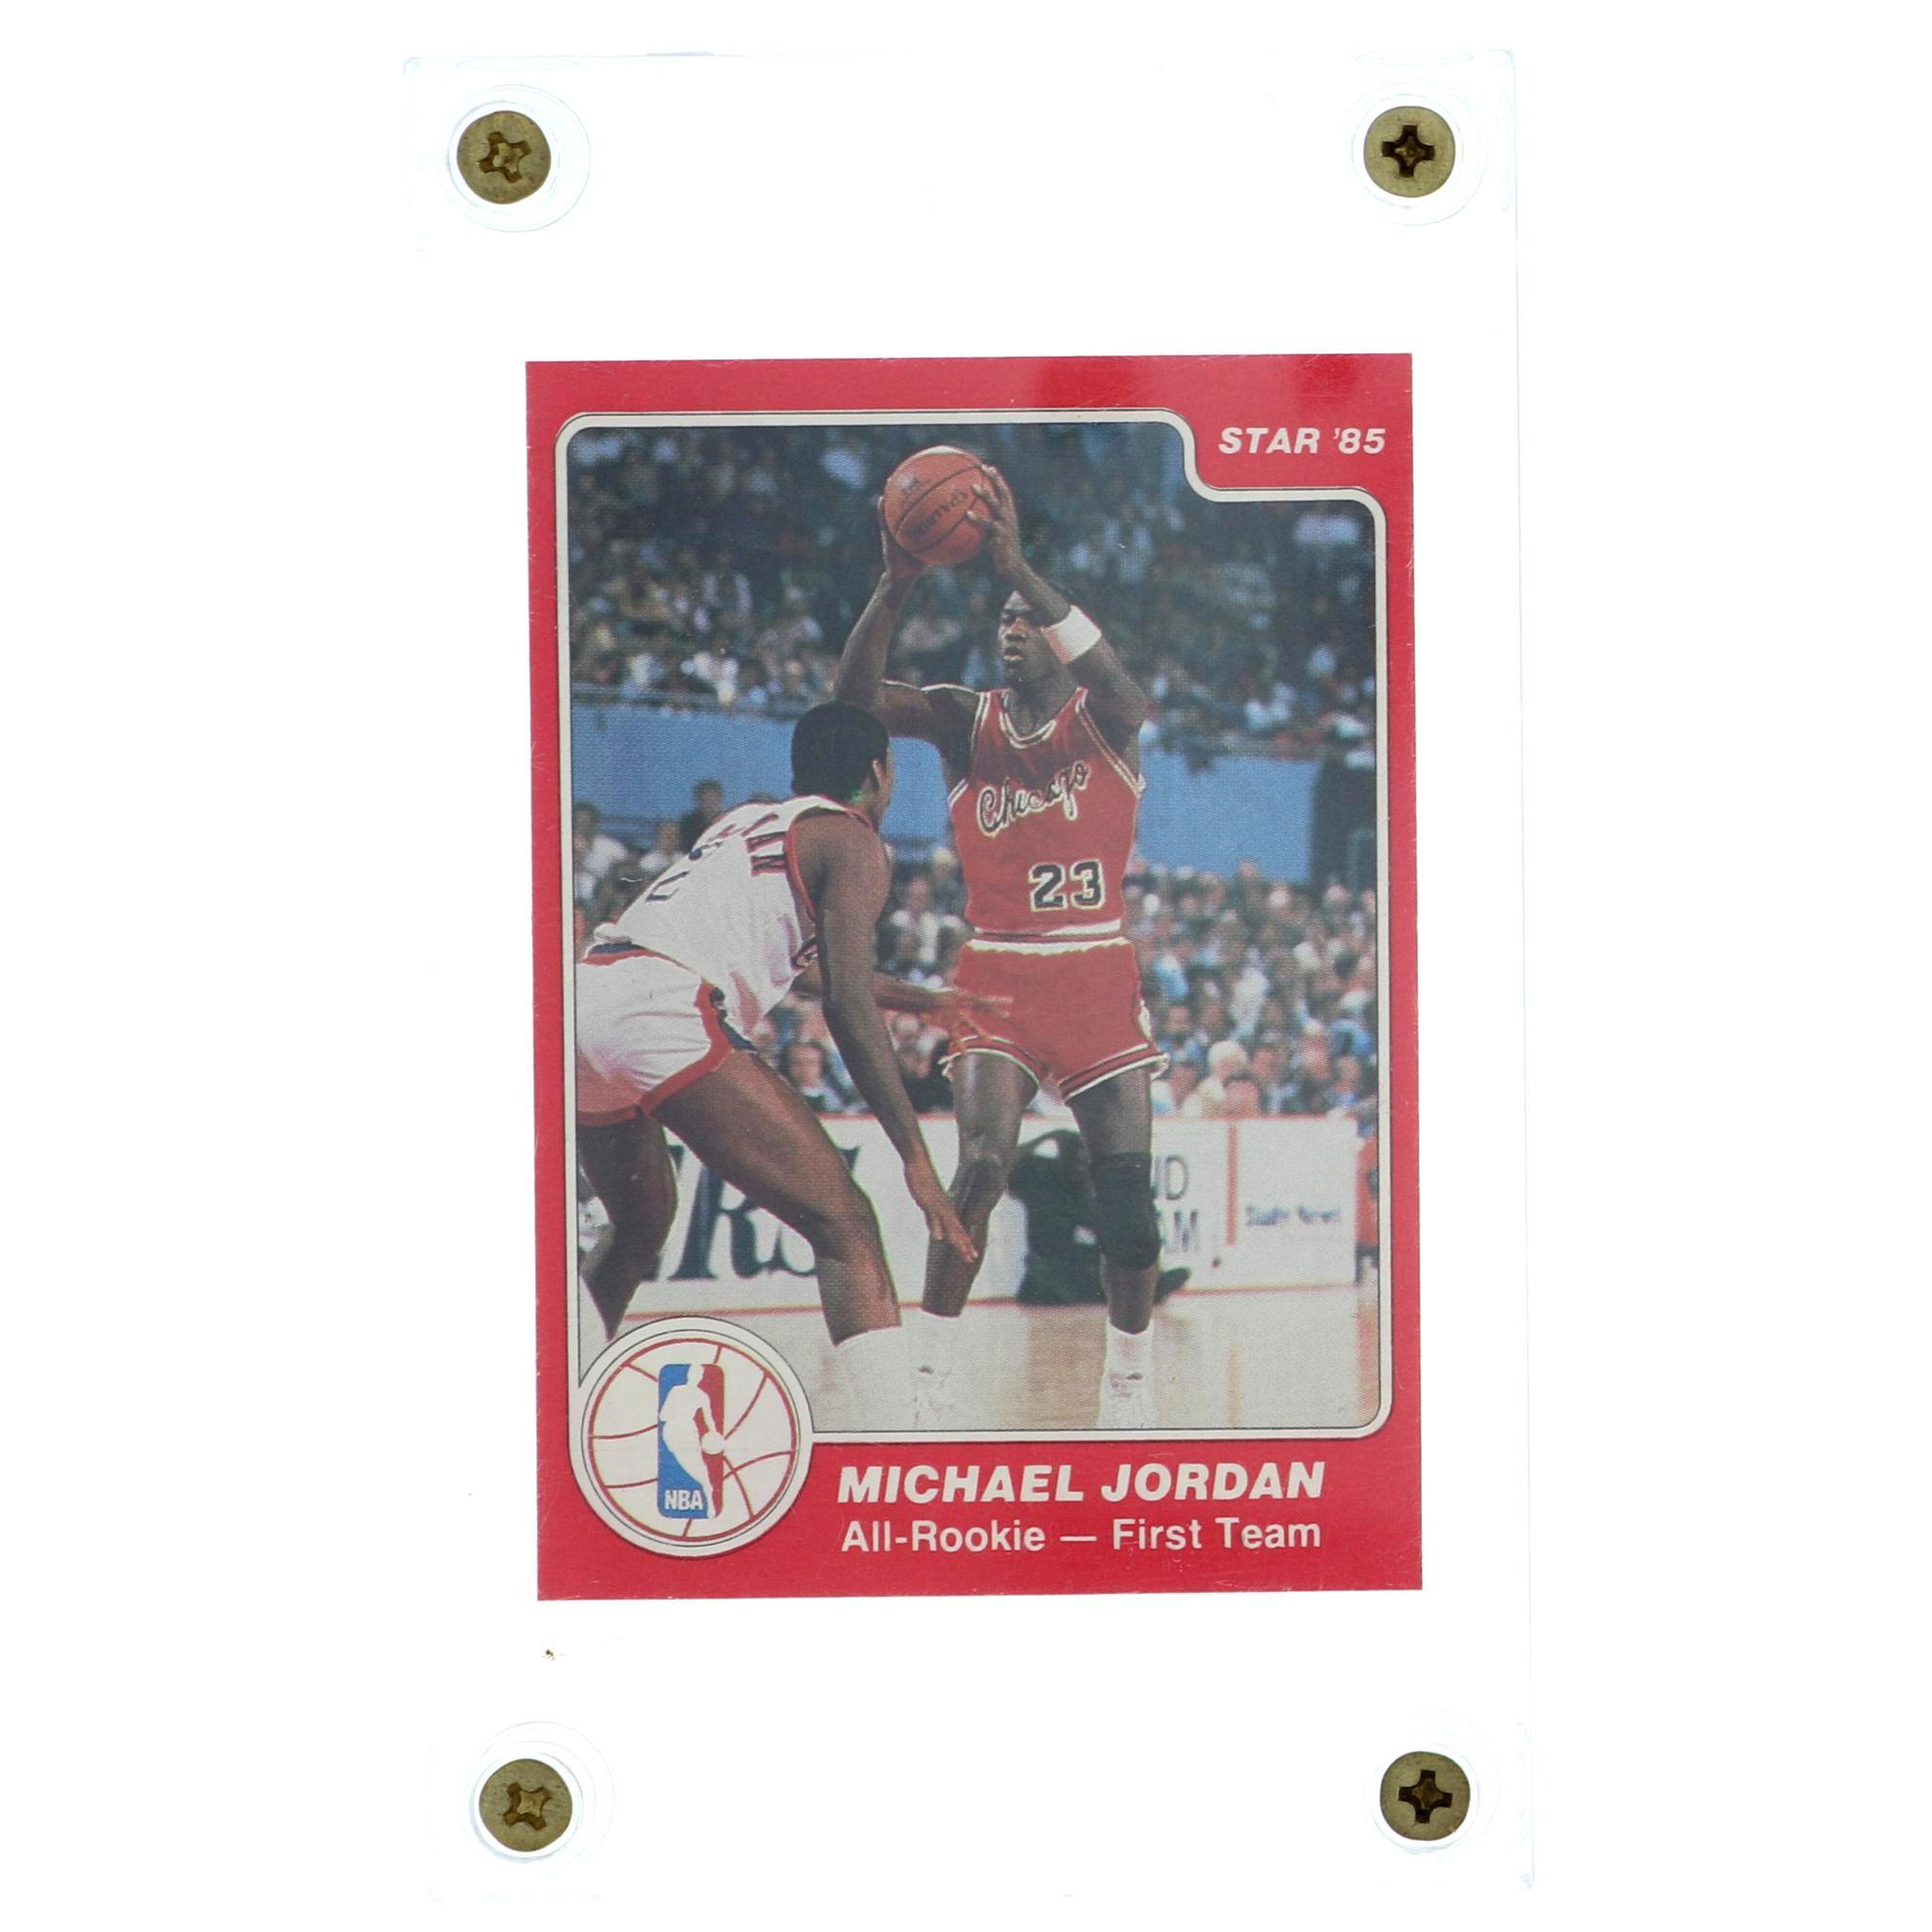 release date 42413 16664 7 16 19 ~ U.S. Marshals Servi   Gaston   Sheehan Auctioneers